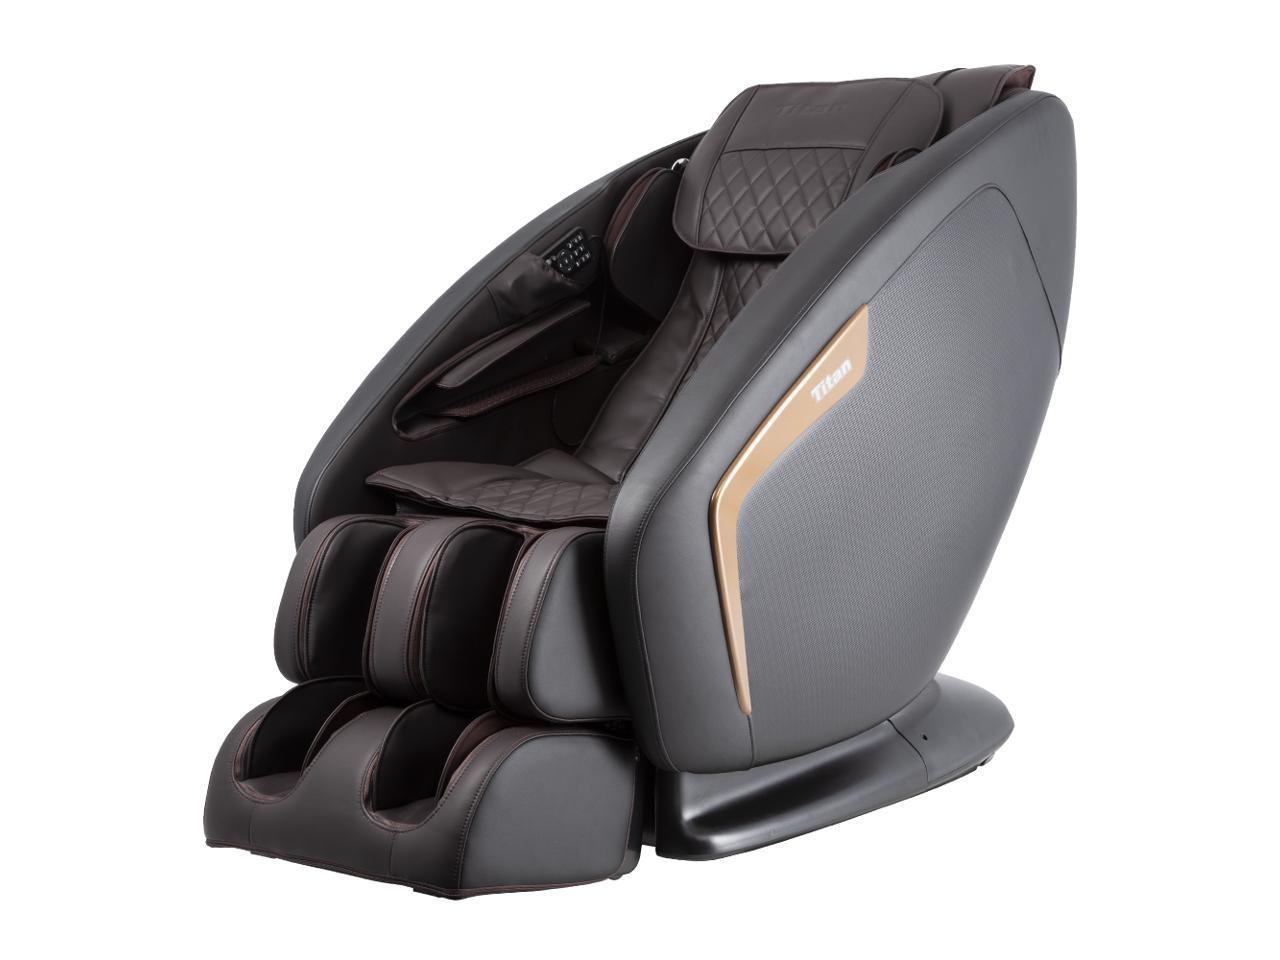 Titan Pro Ace II 3D Massage Chair (2019 New Model) - $2499 + Free Shipping